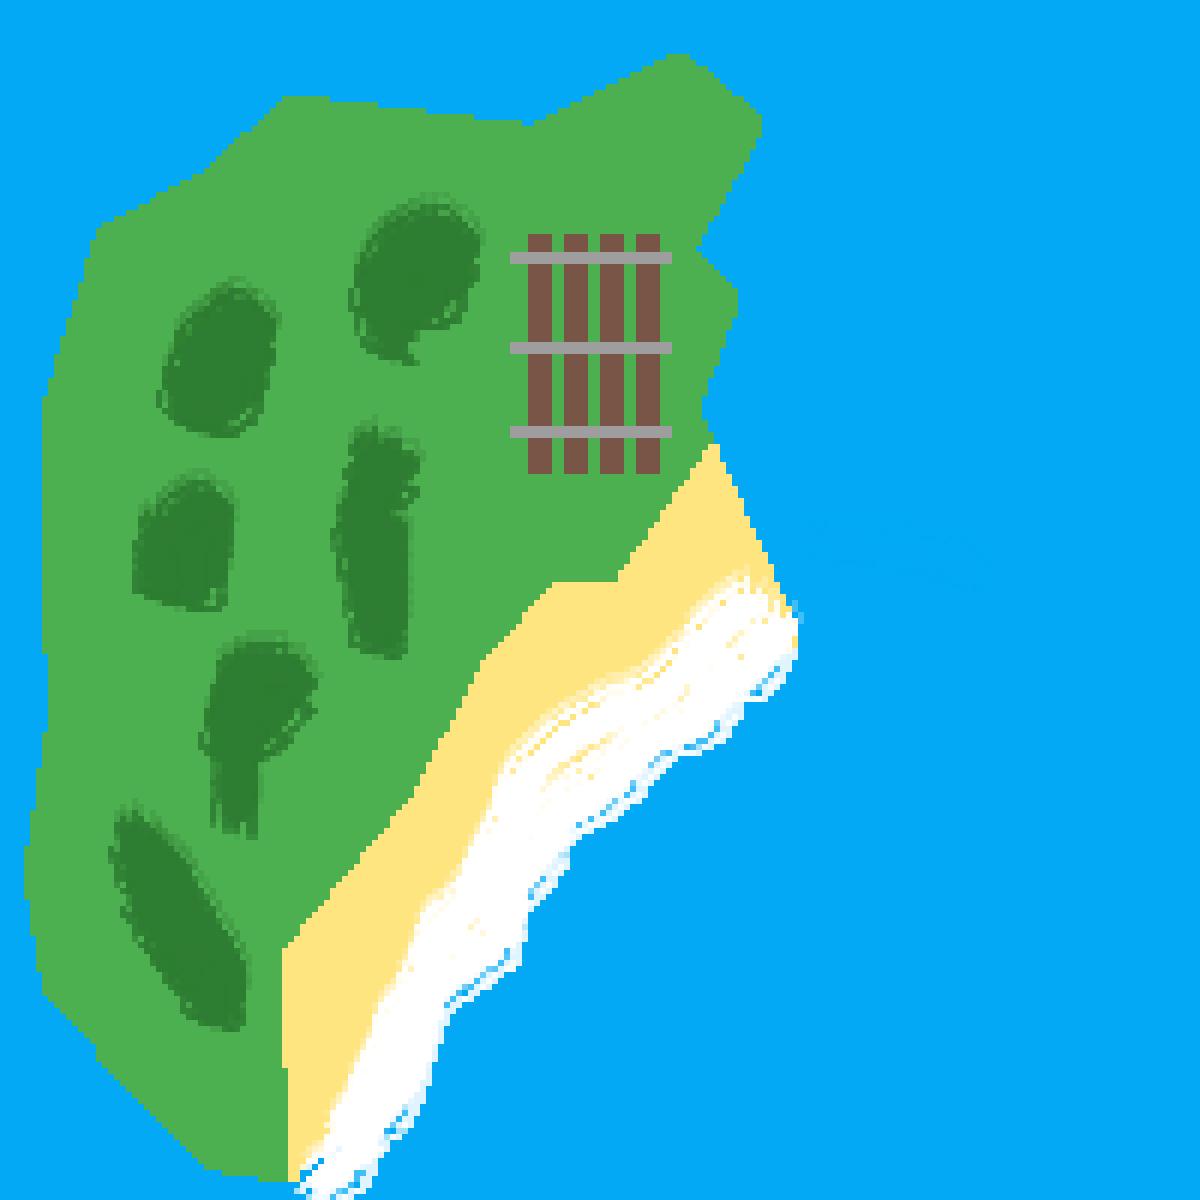 island by Midorya